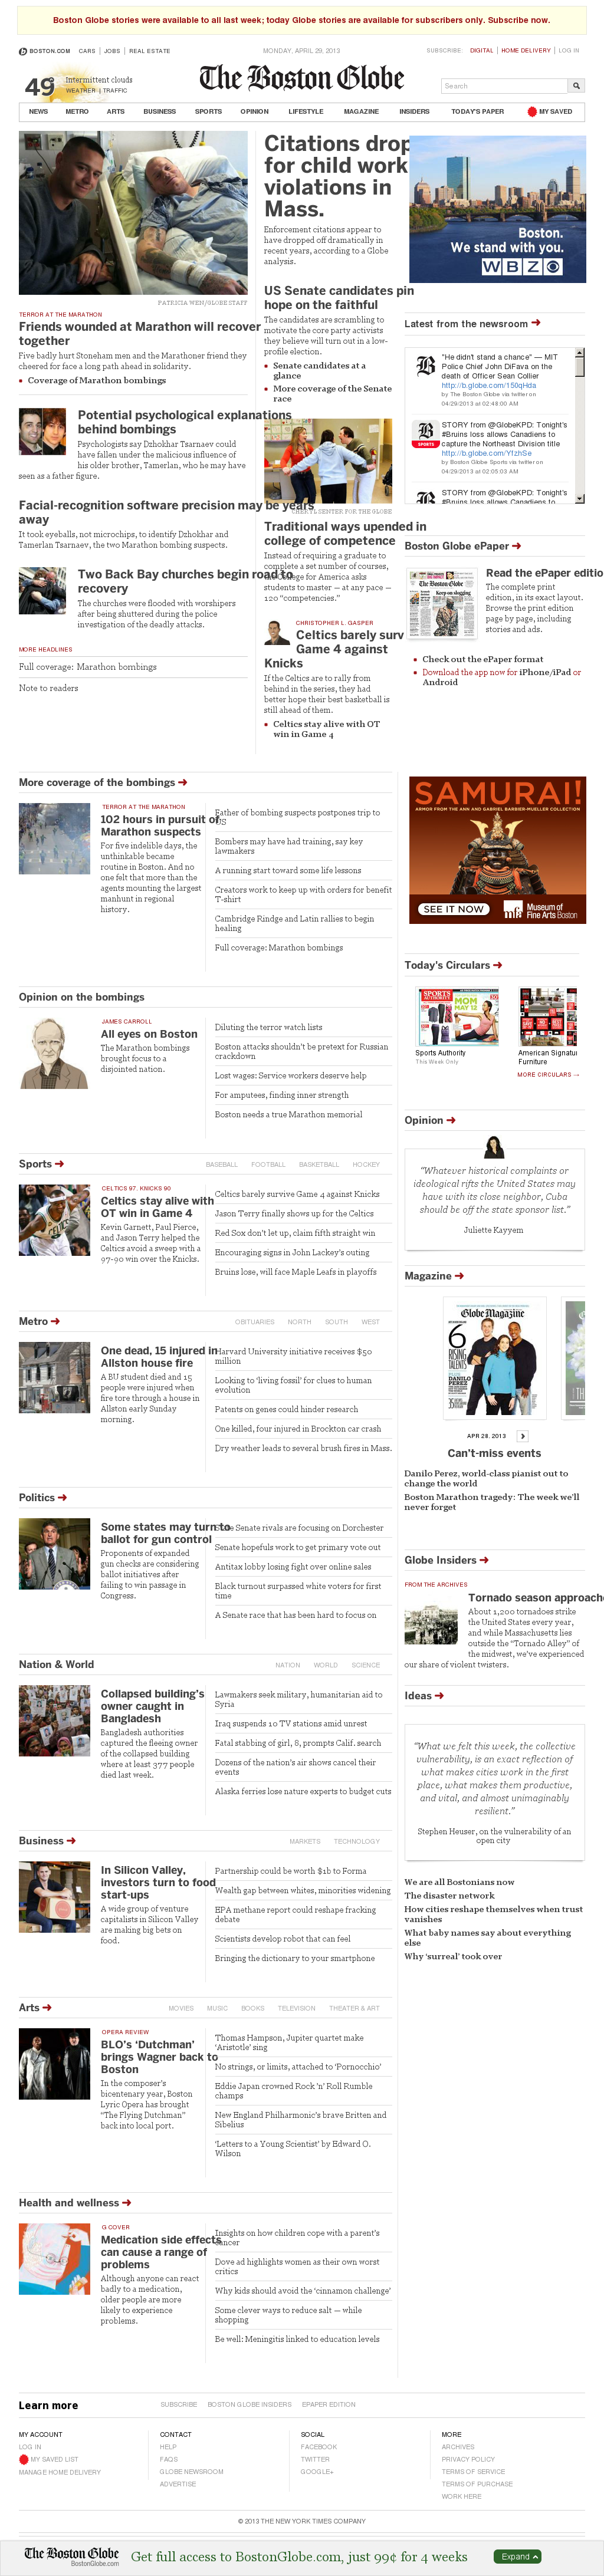 The Boston Globe at Monday April 29, 2013, 11:02 a.m. UTC